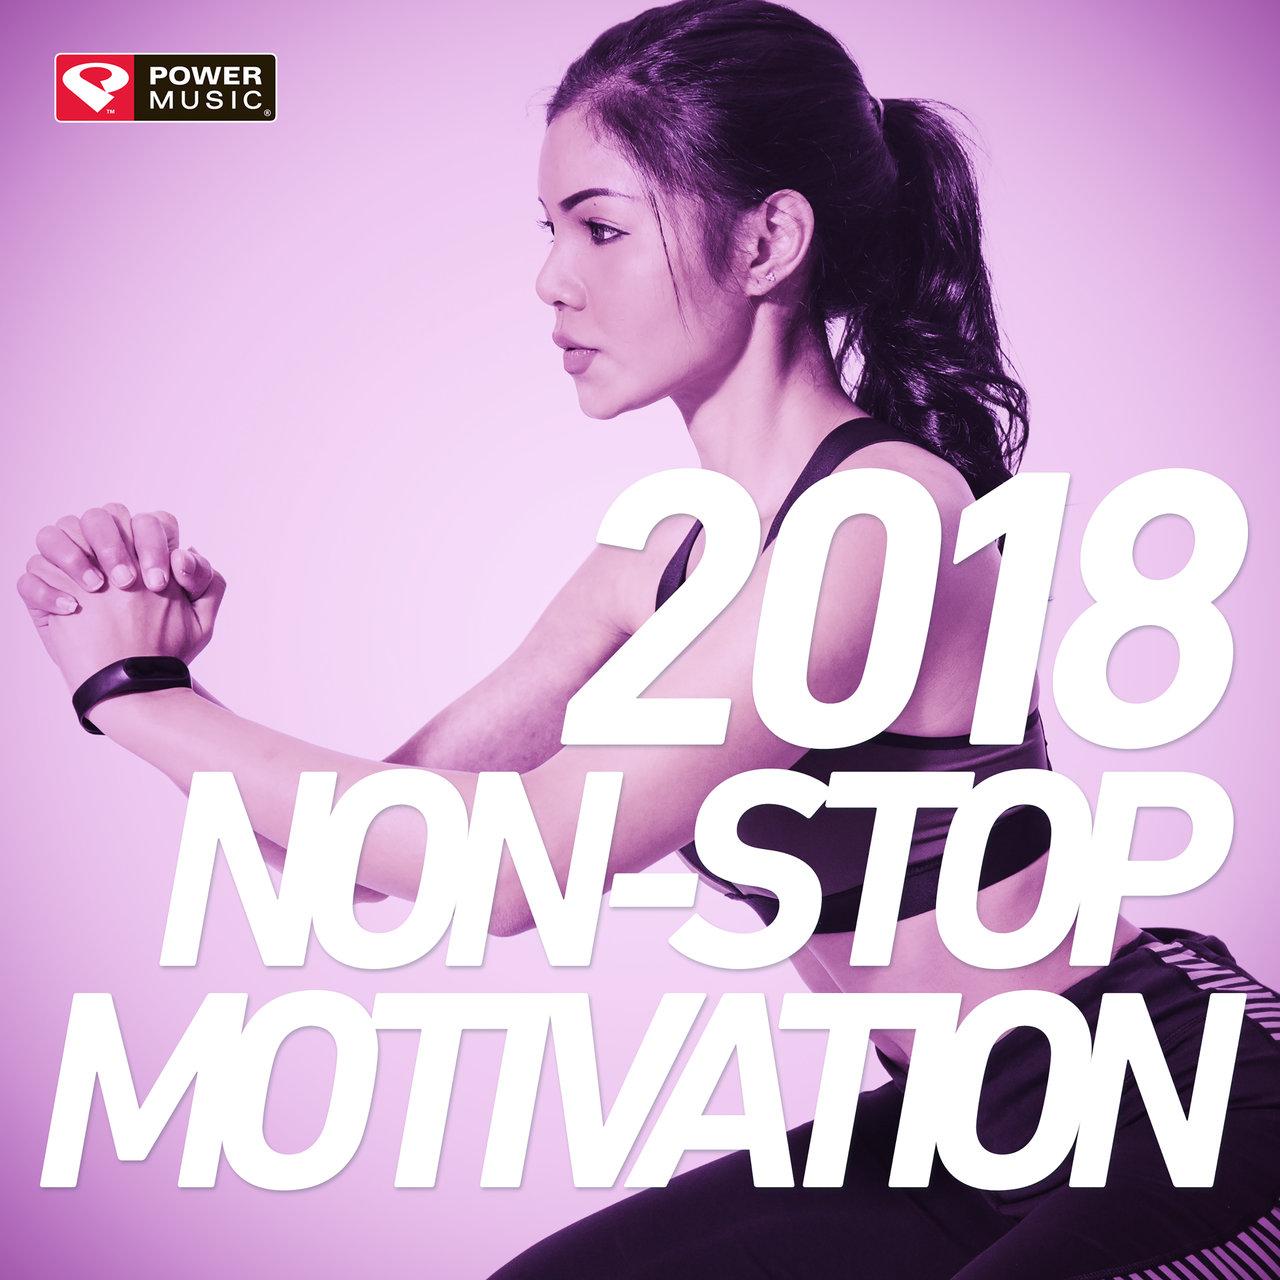 2018 Non-Stop Motivation (60 Min Non-Stop Workout Mix 130